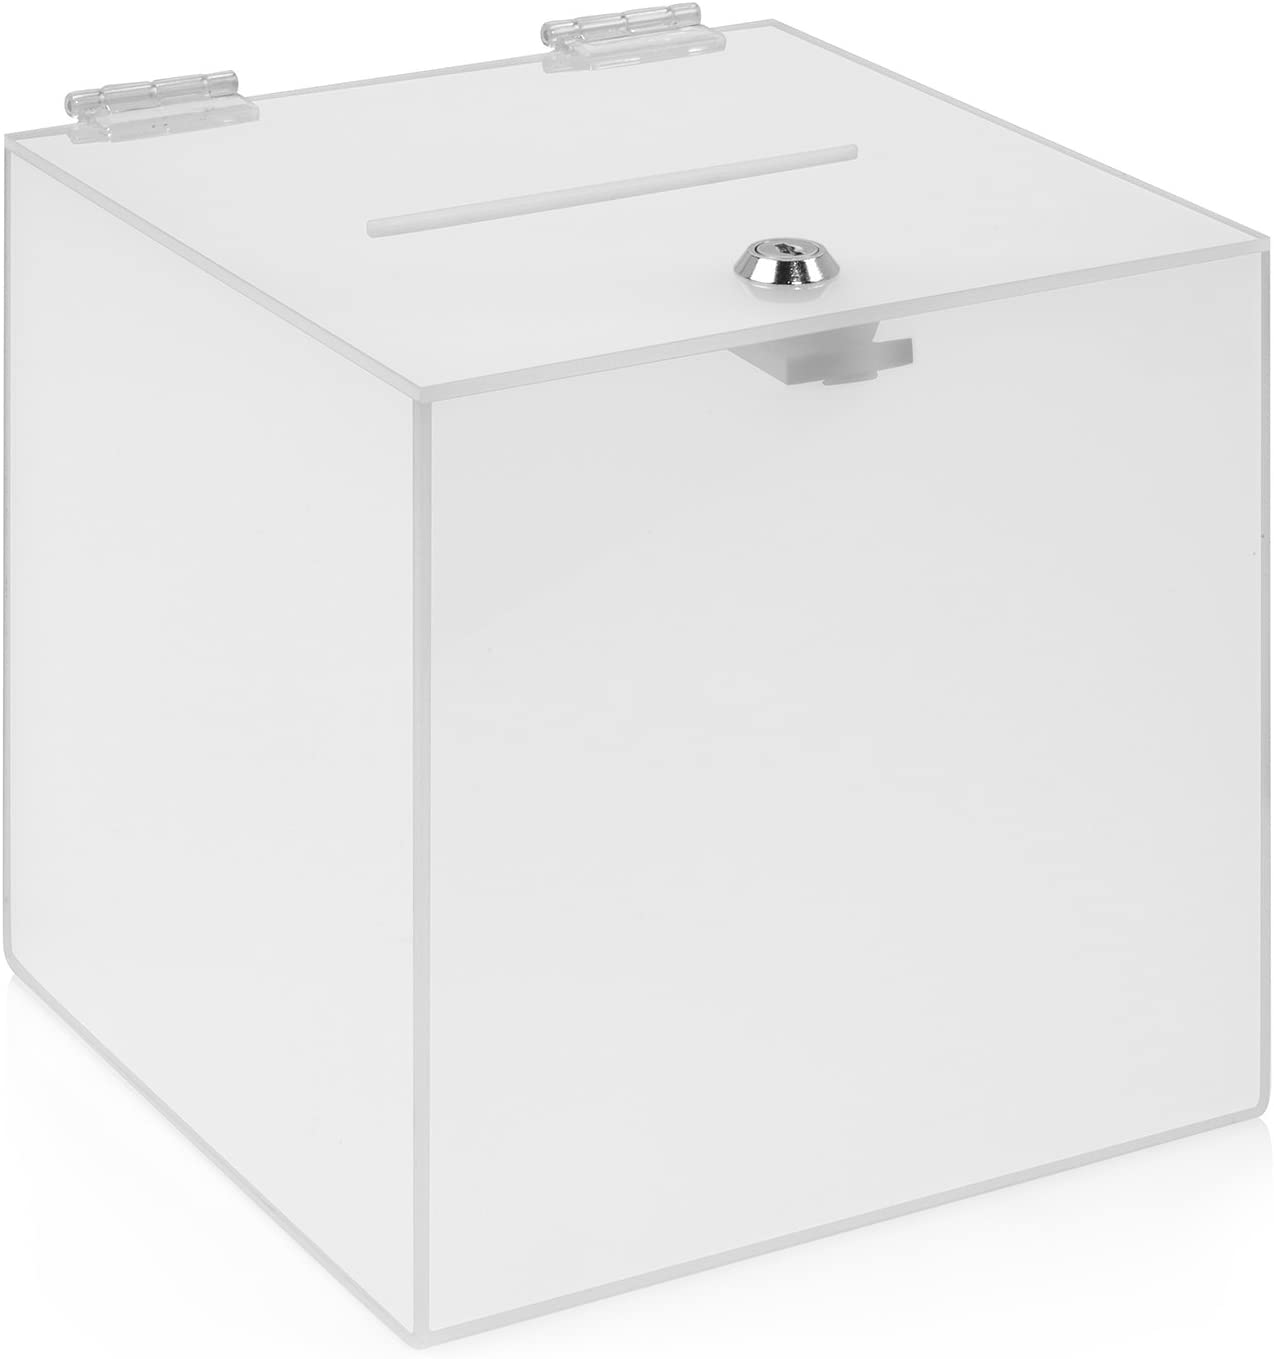 Kit Box Votaciones/200 x 200 x 200 mm con candado, de acrílico opaco/Dona Caja/ranura Caja/sorteo parte Caja/urna/acrílico/leche Cristal/Opal/lechoso/Visión resistente al/abschließbar – zeigis®: Amazon.es: Oficina y papelería